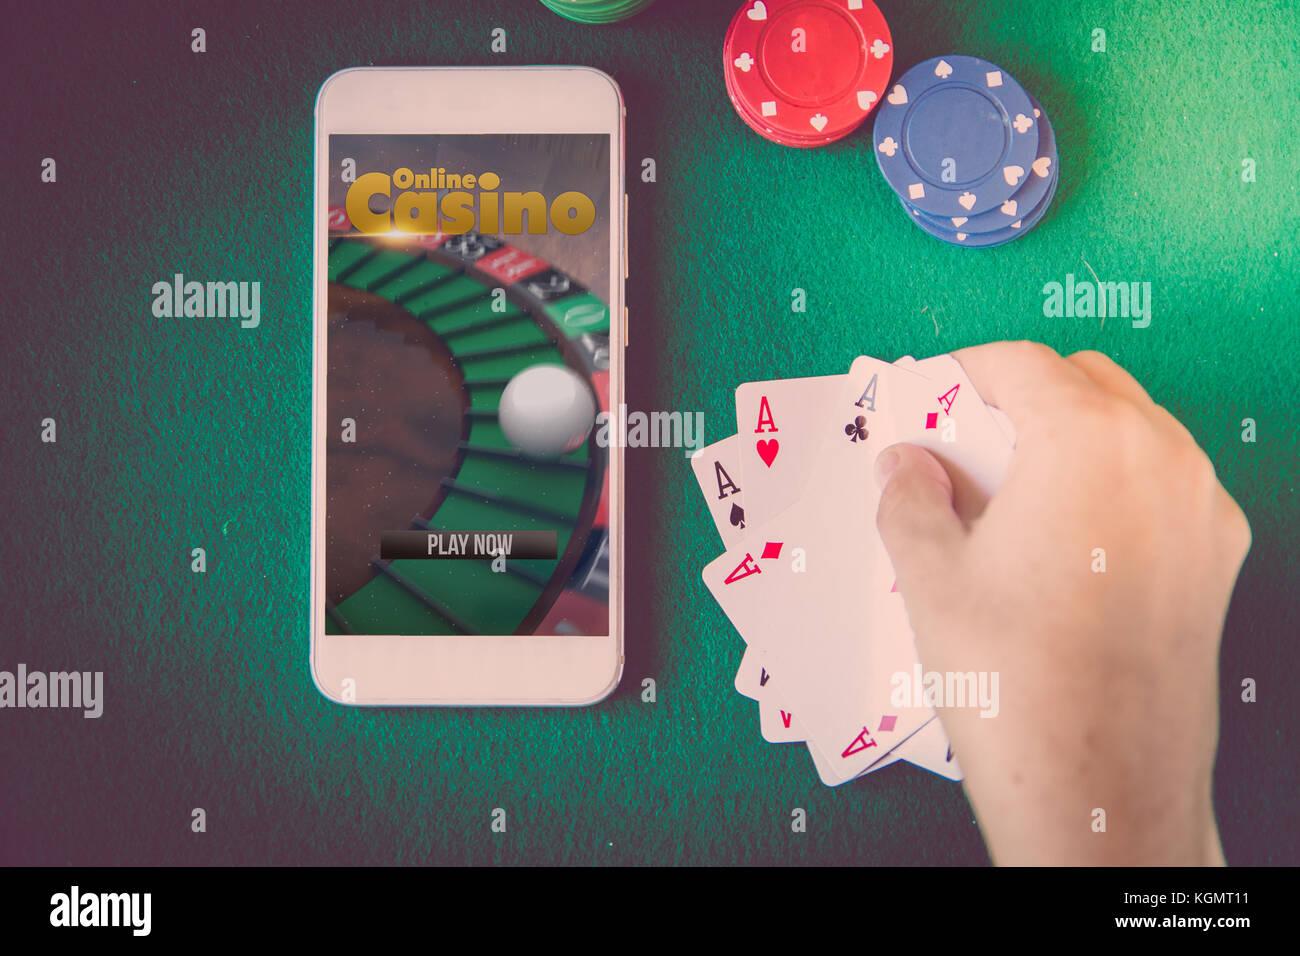 uk online gambling market value